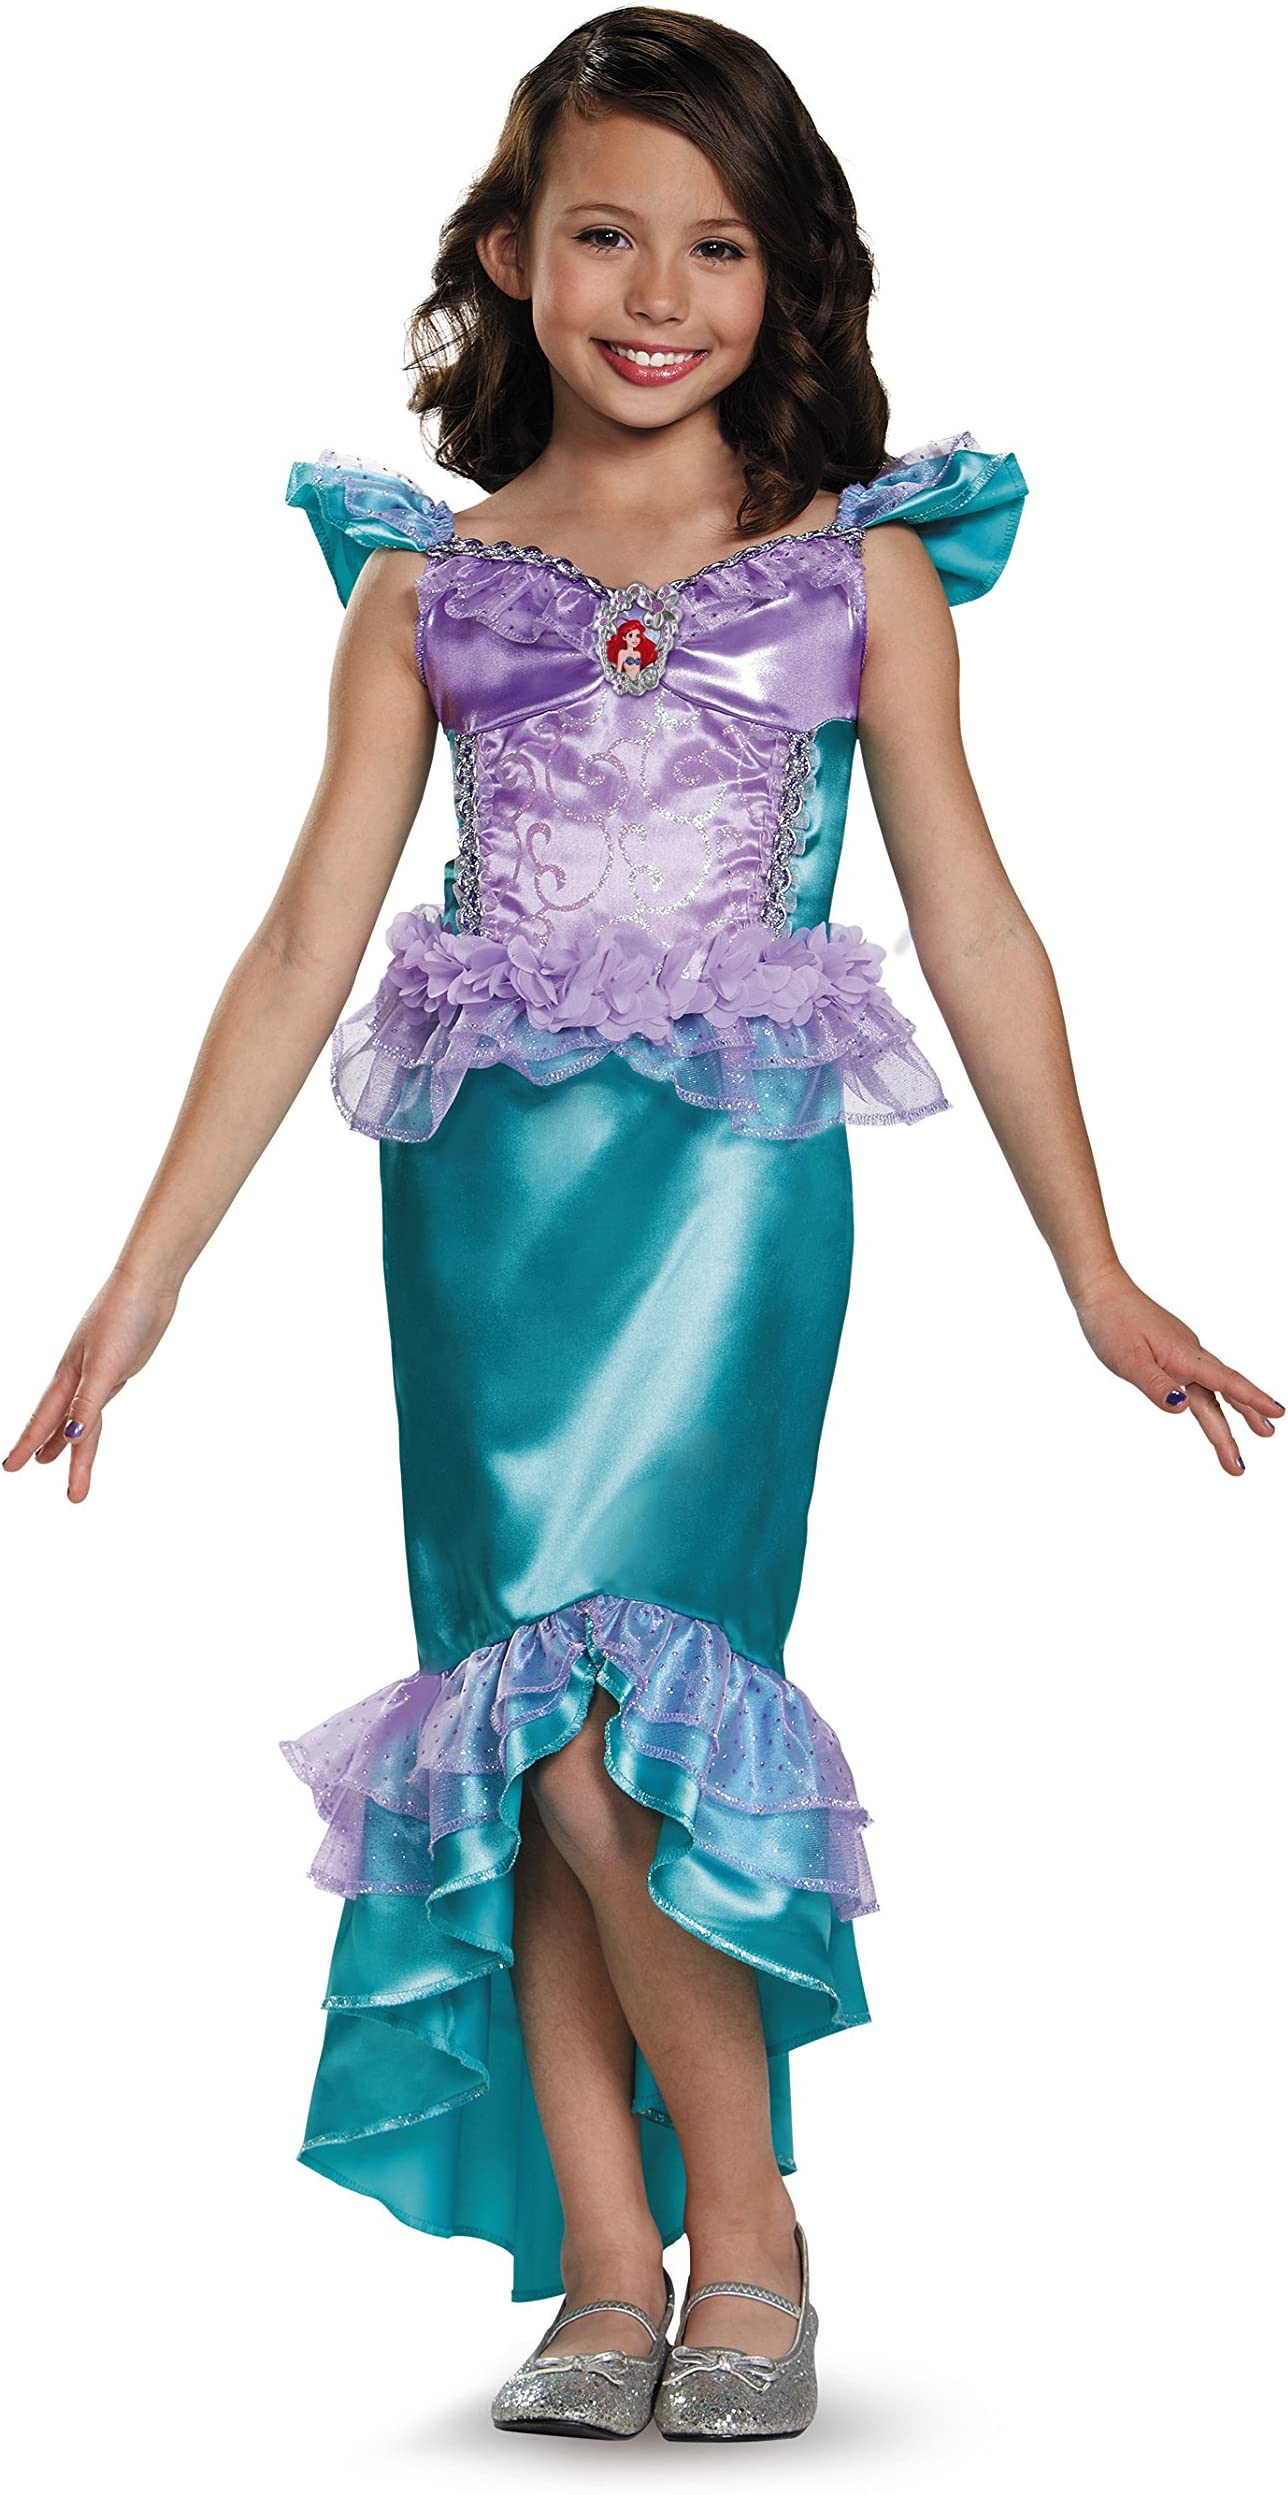 Toddler Girls Mermaid Princess Costume Dress Sz 12 months Handmade Ready to Ship